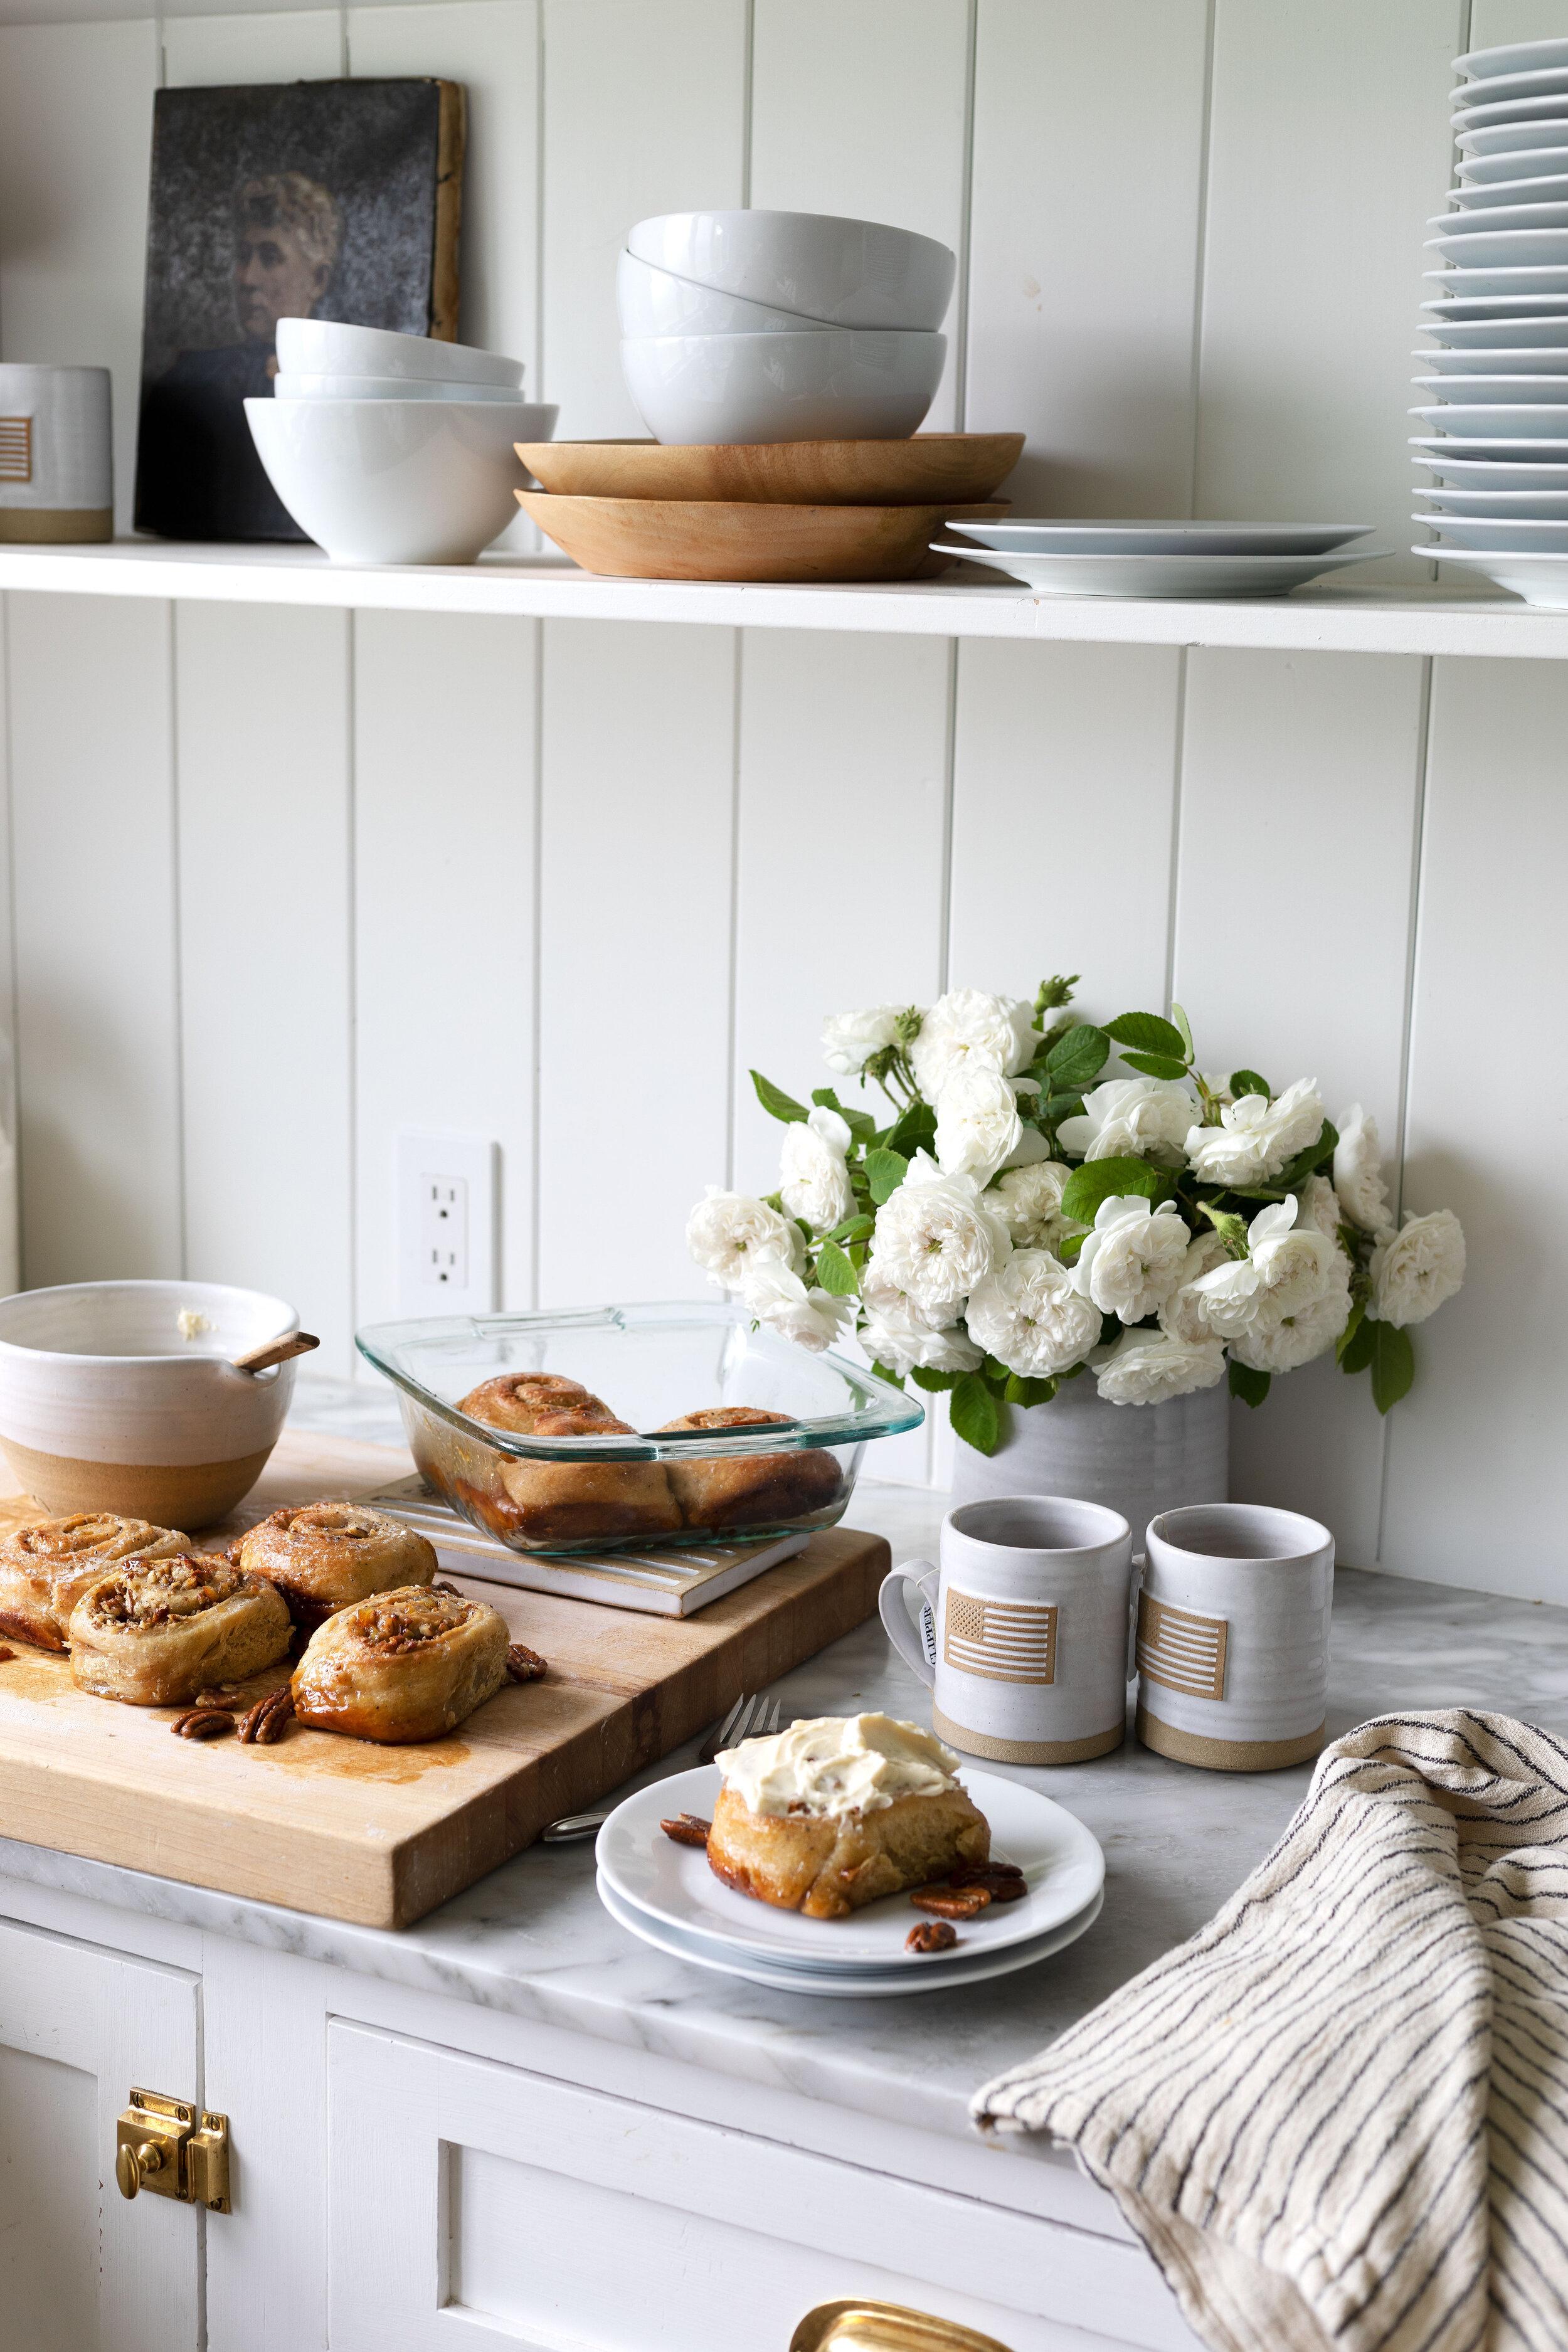 The-Grit-and-Polish---Farmhouse-Kitchen-Cardamom-Rolls-+-Flag-Mugs-7.3.jpg